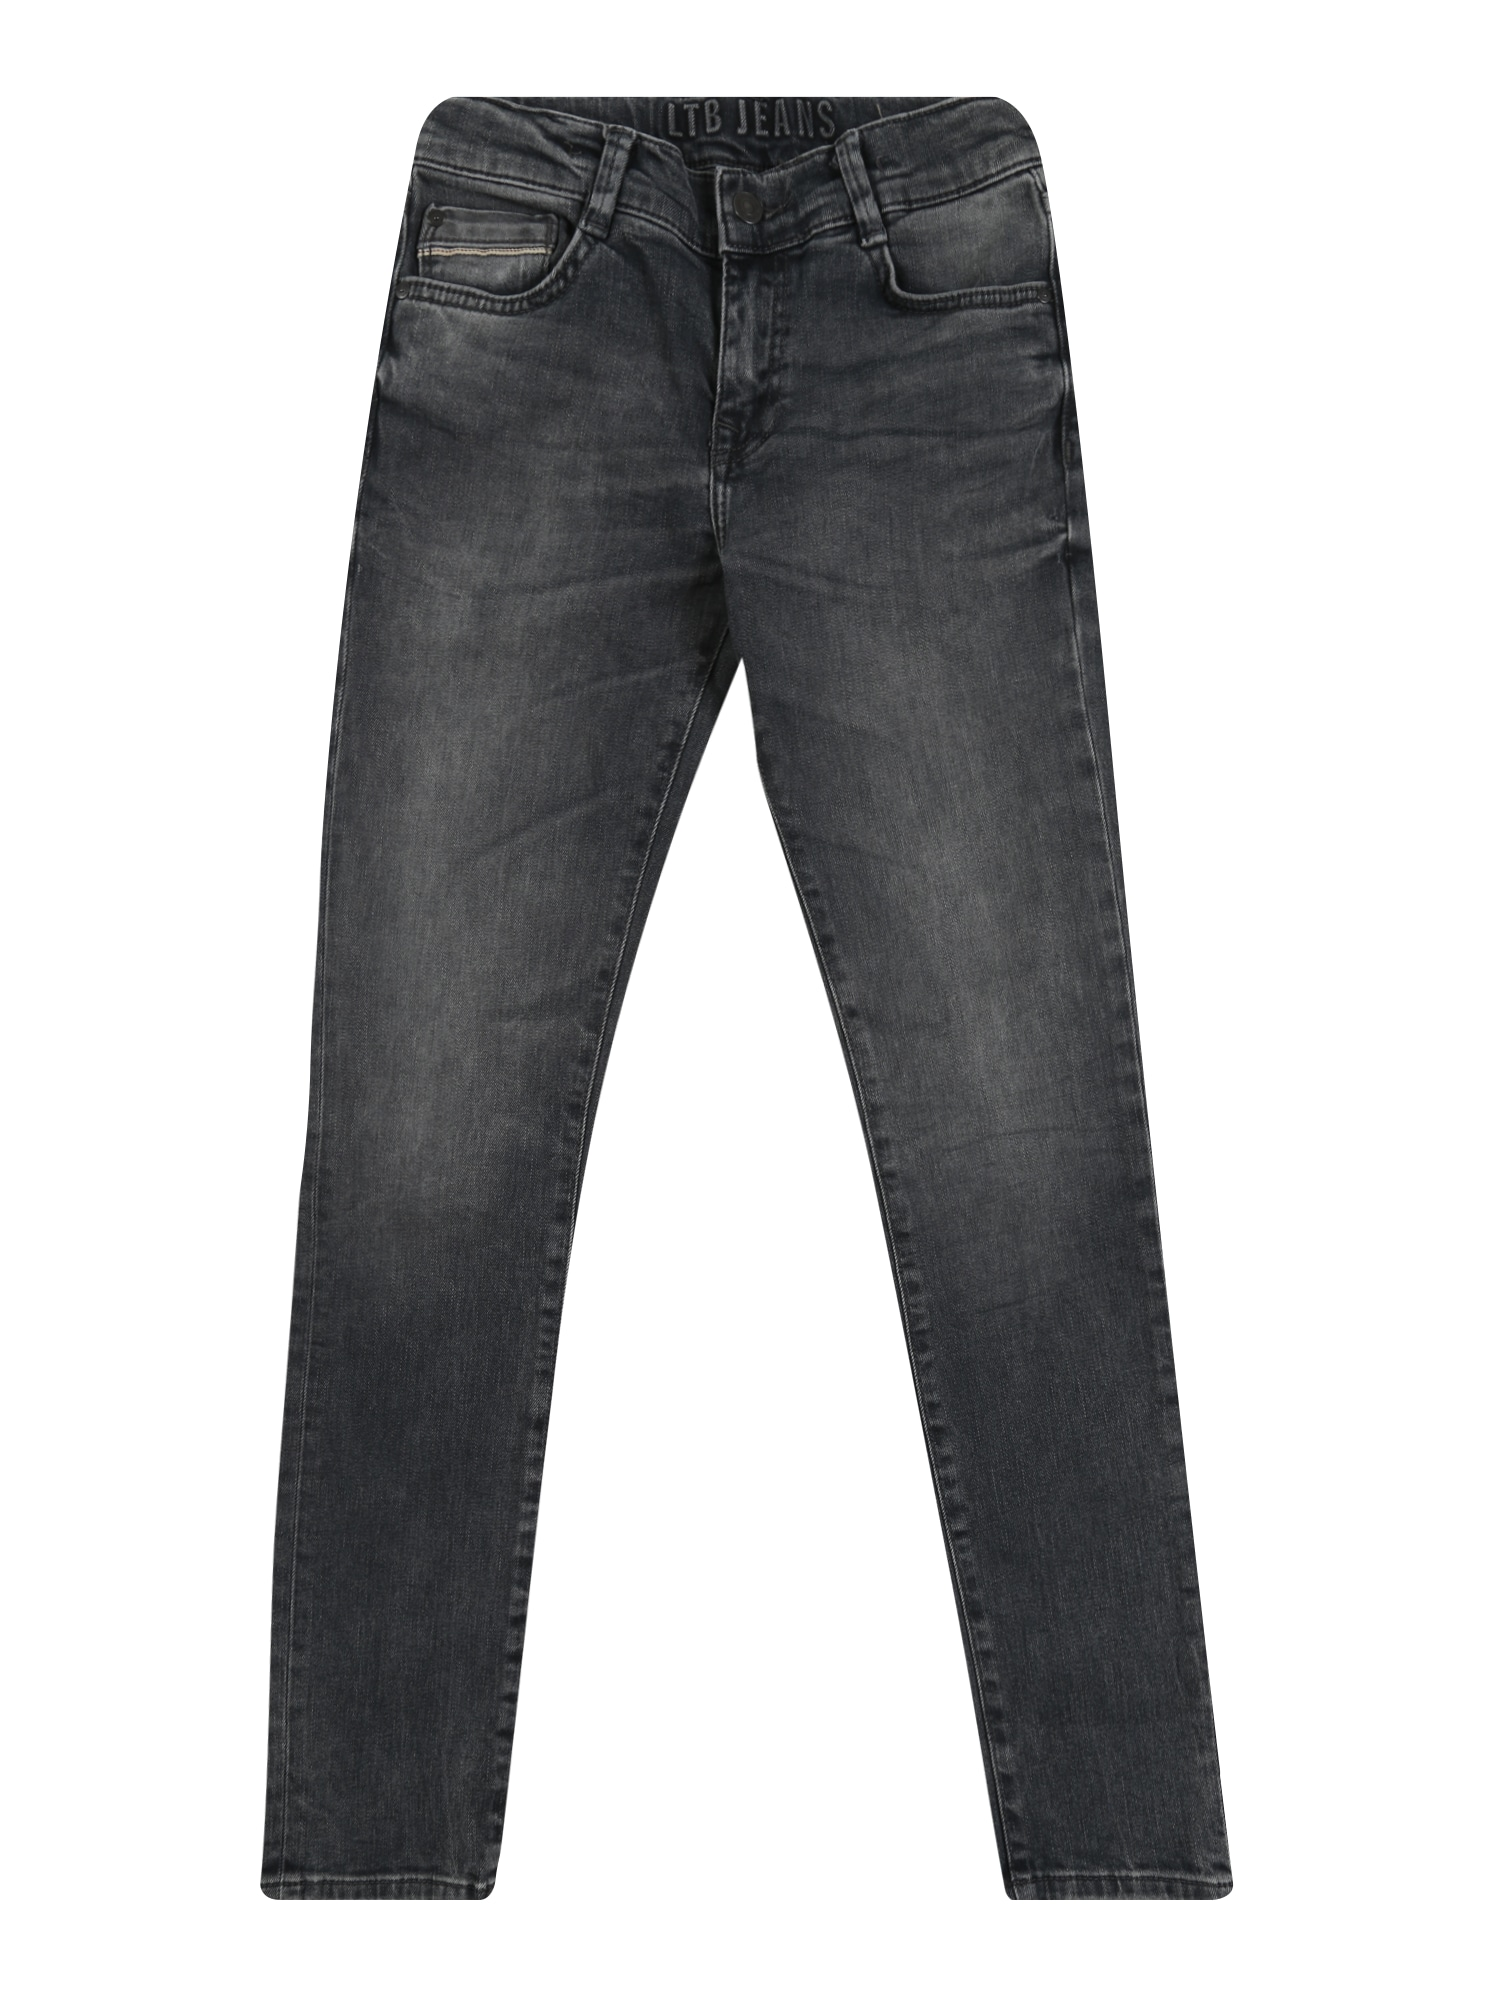 LTB Džinsai 'NEW COOPER B' tamsiai (džinso) mėlyna